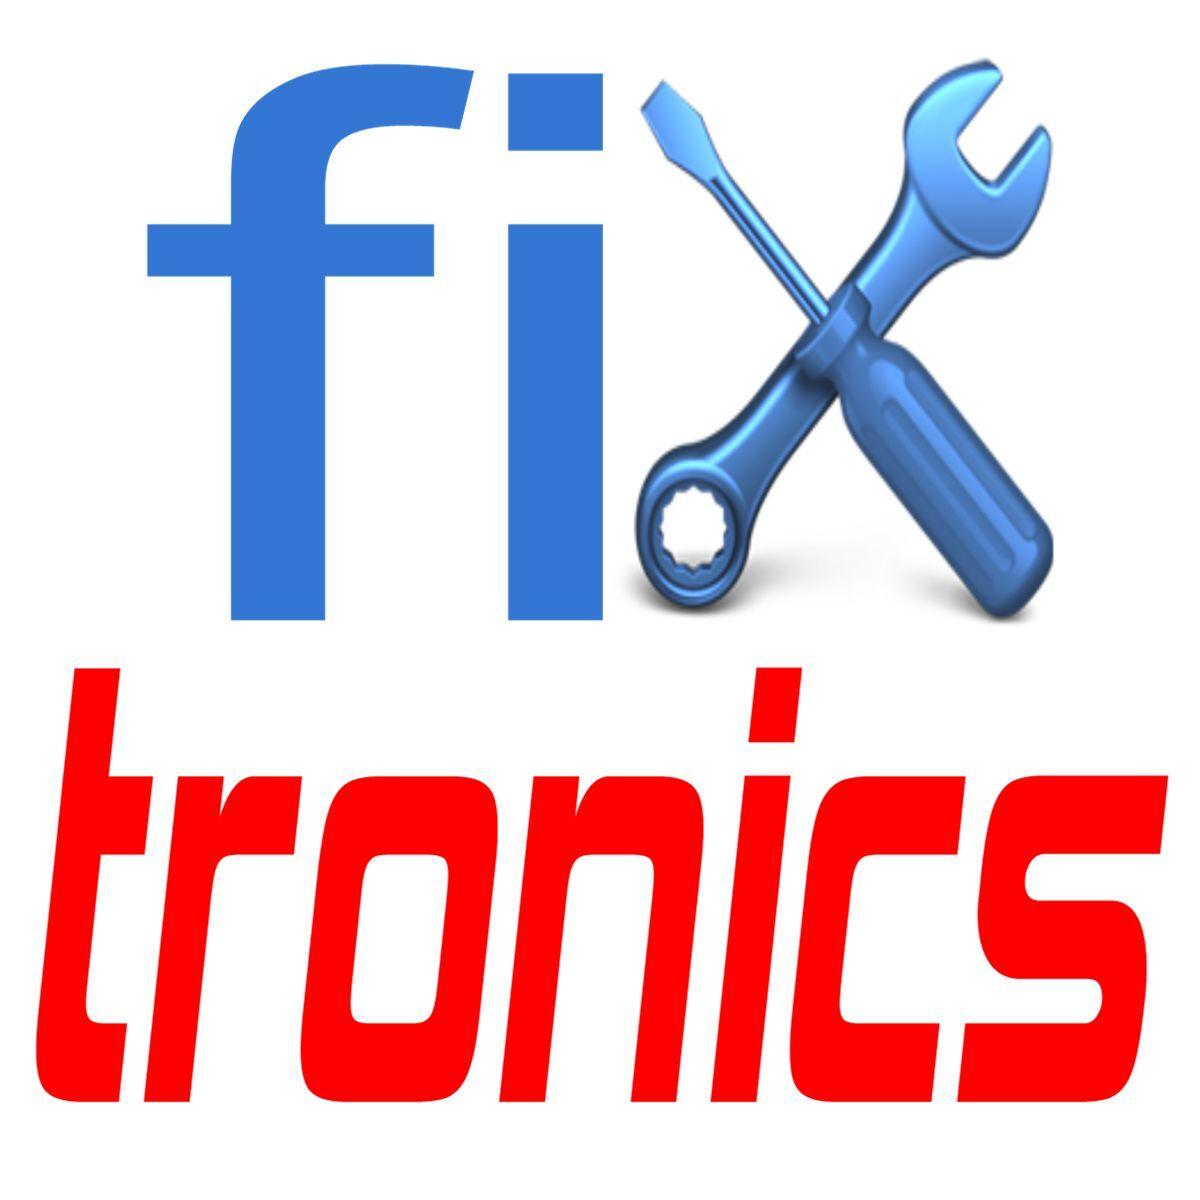 Fixtronics